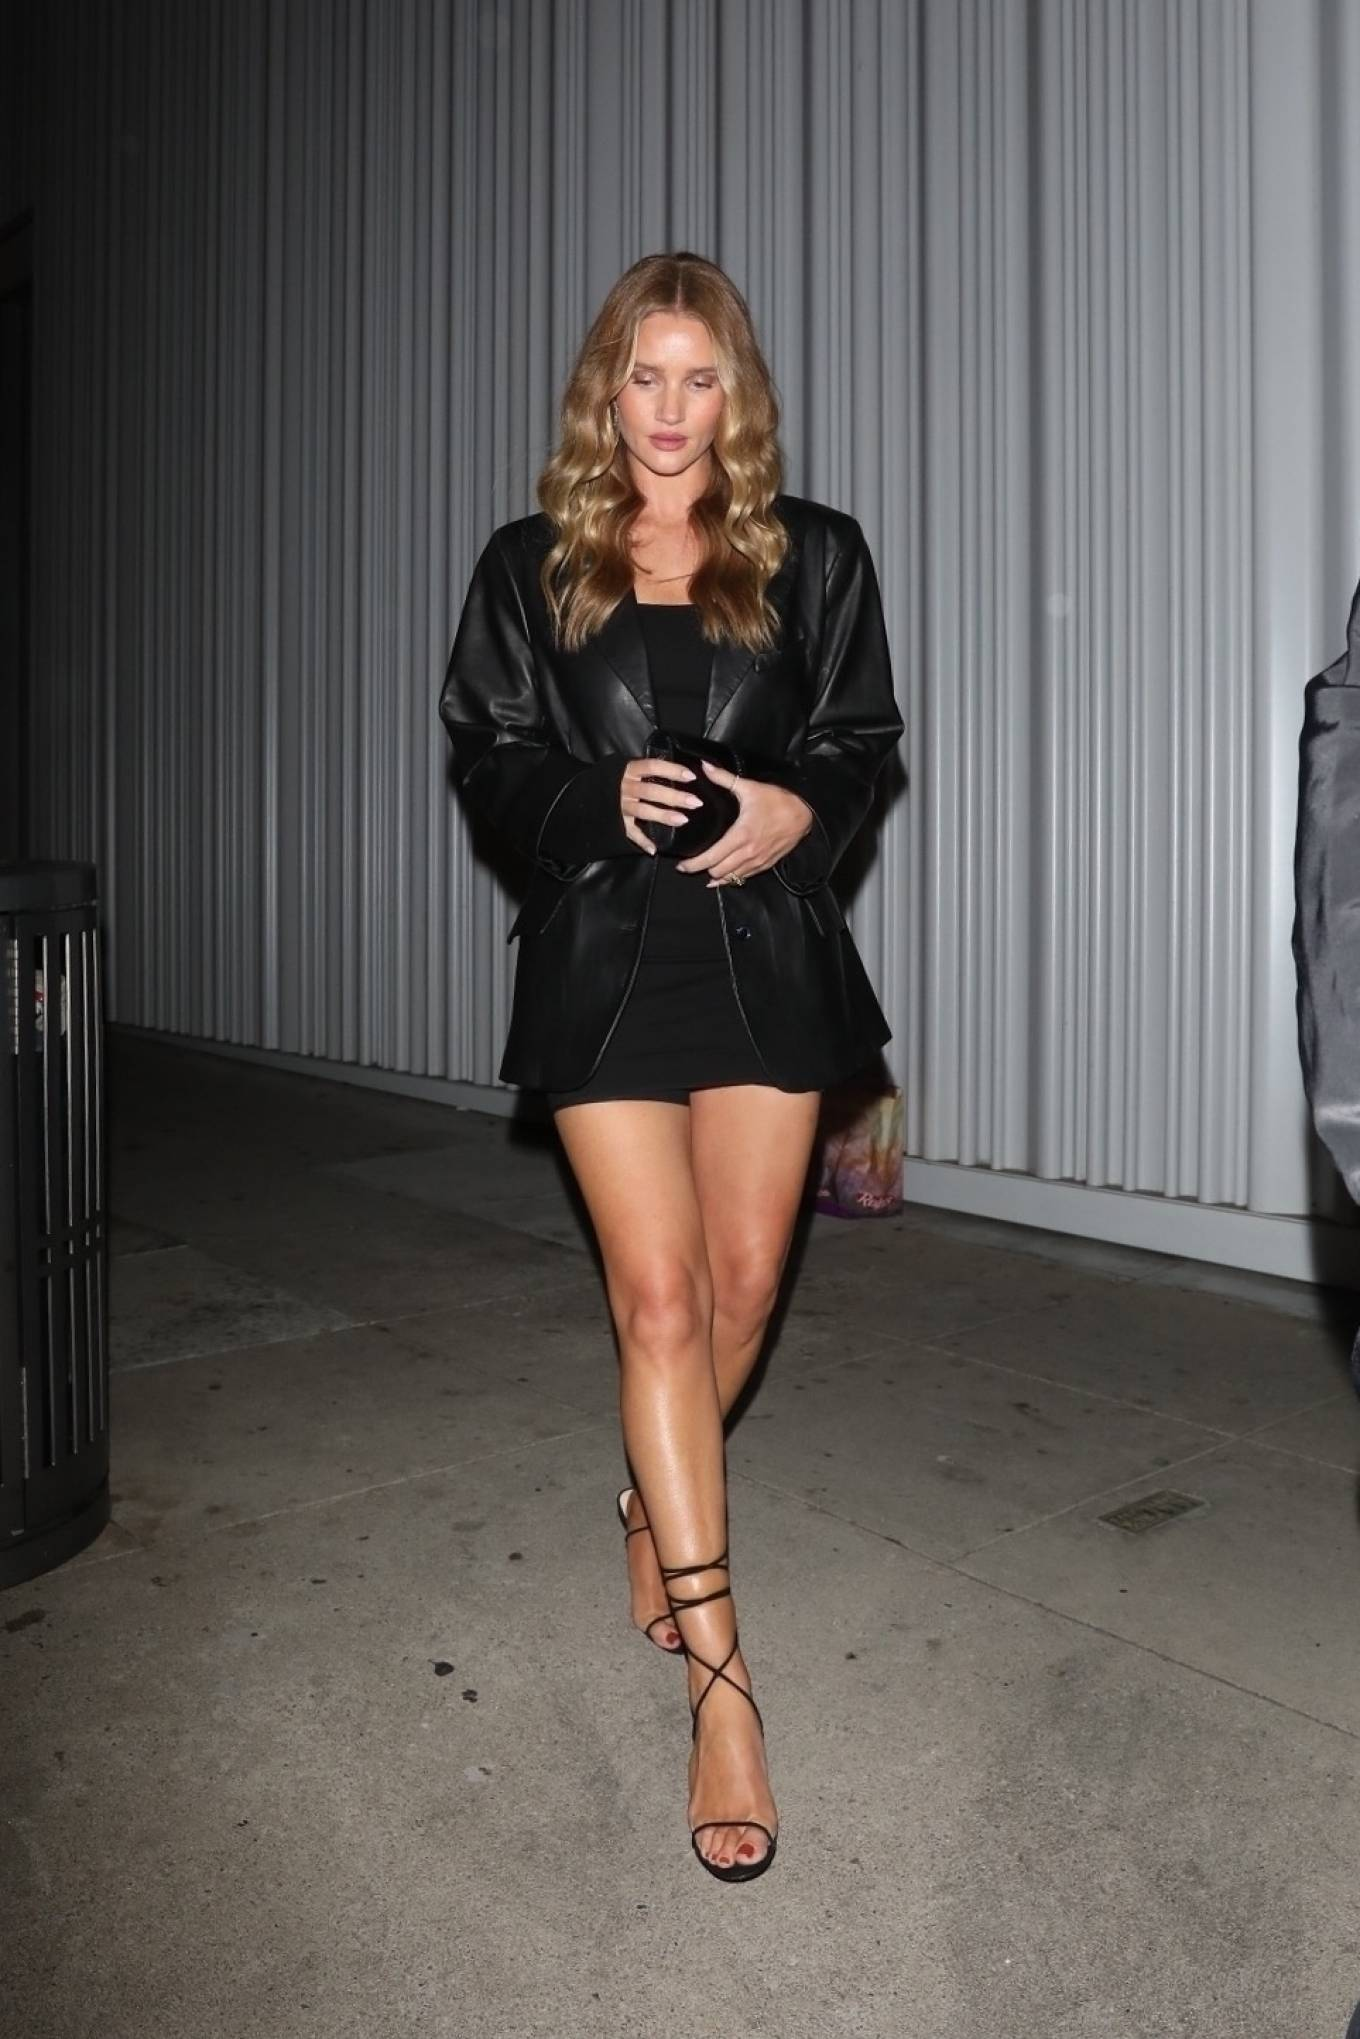 Rosie Huntington-Whiteley - In mini black dress Exits a Birthday celebration at Mr Chow in LA